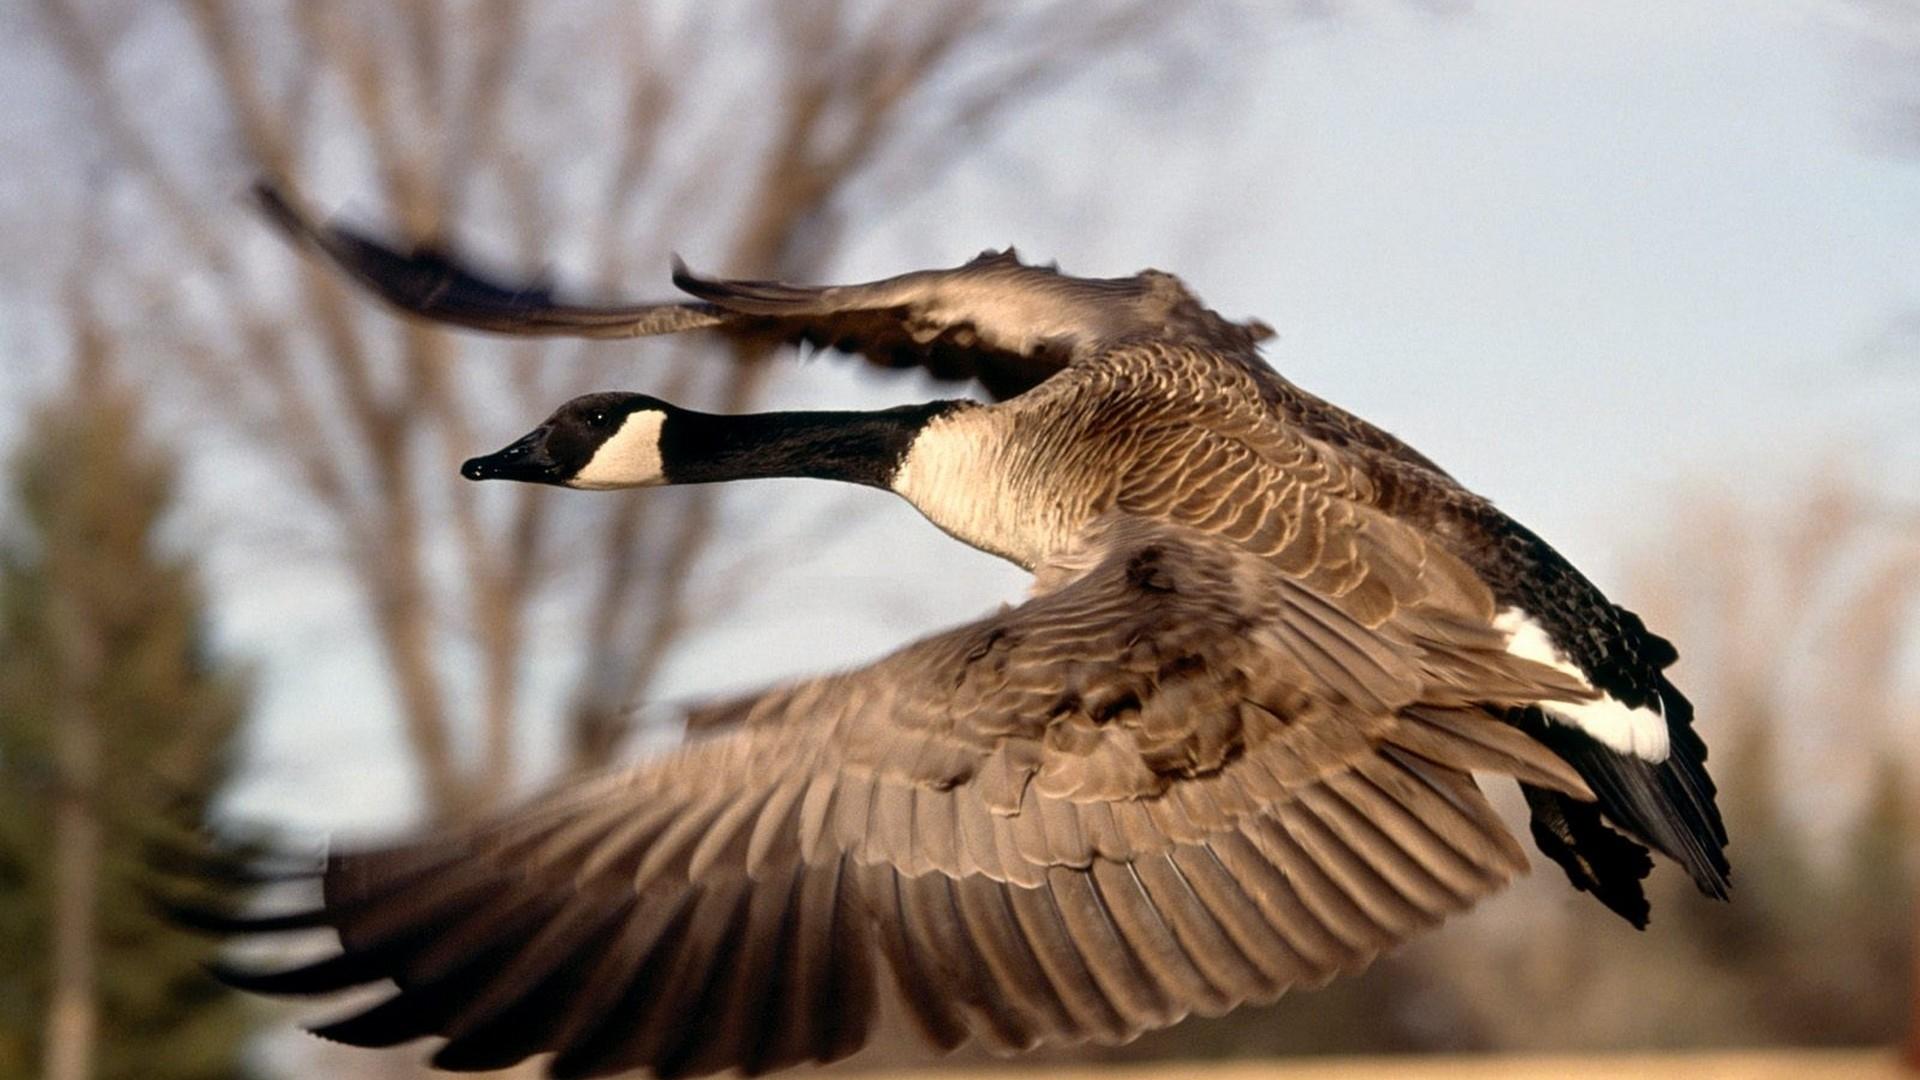 canada flight canadian goose geese 1920x1080 wallpaper Wallpaper 1920x1080